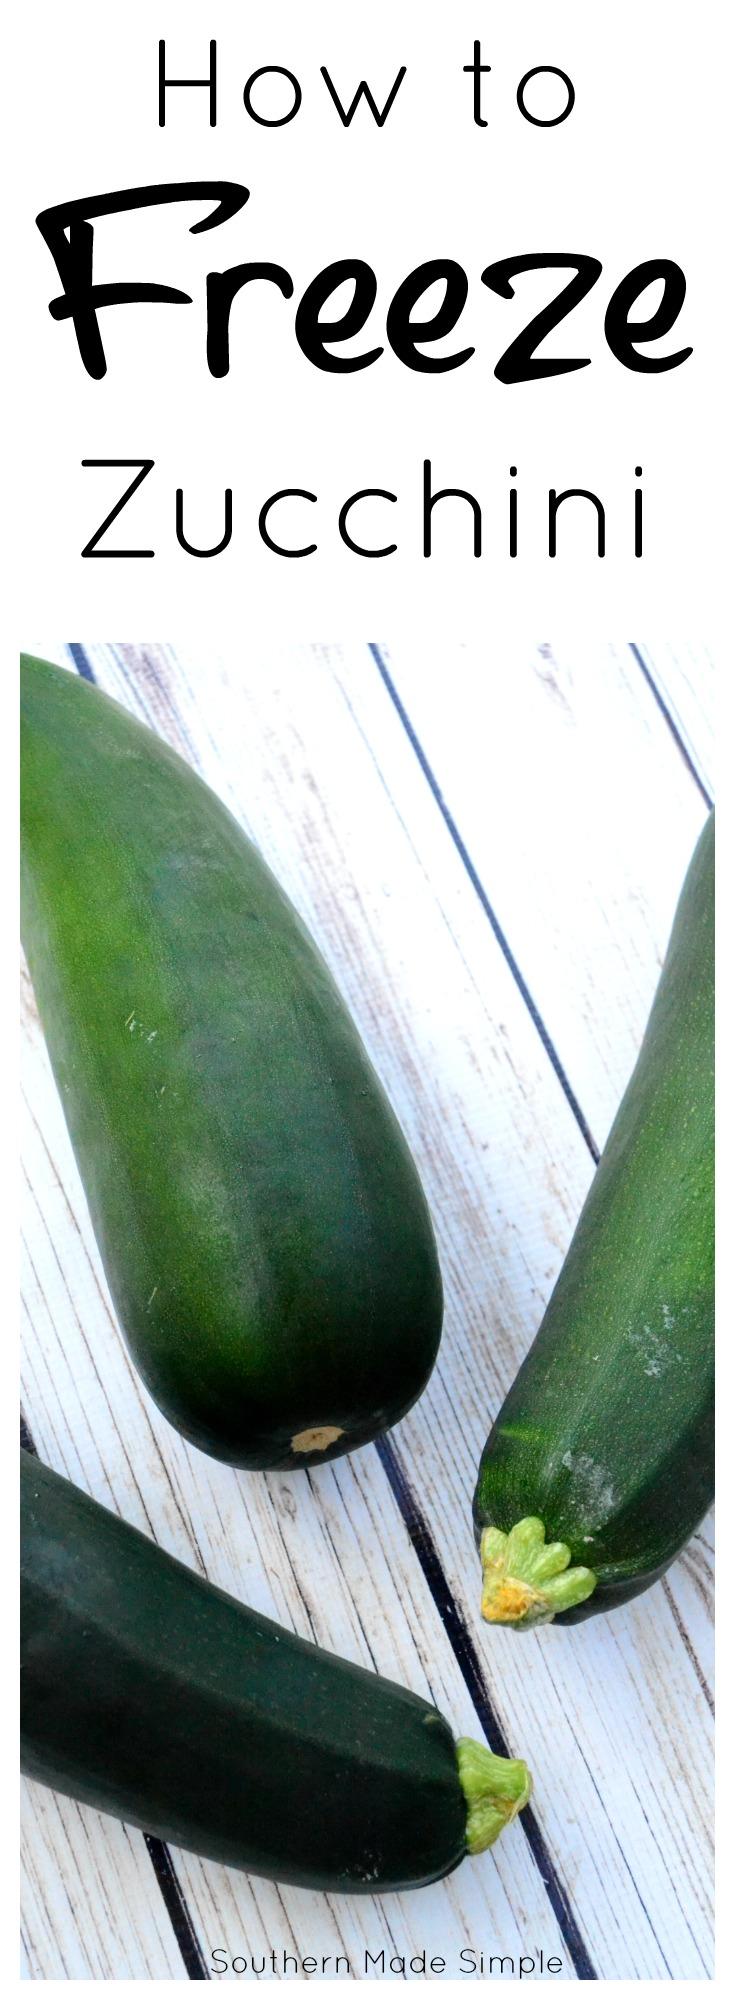 How to Freeze Zucchini